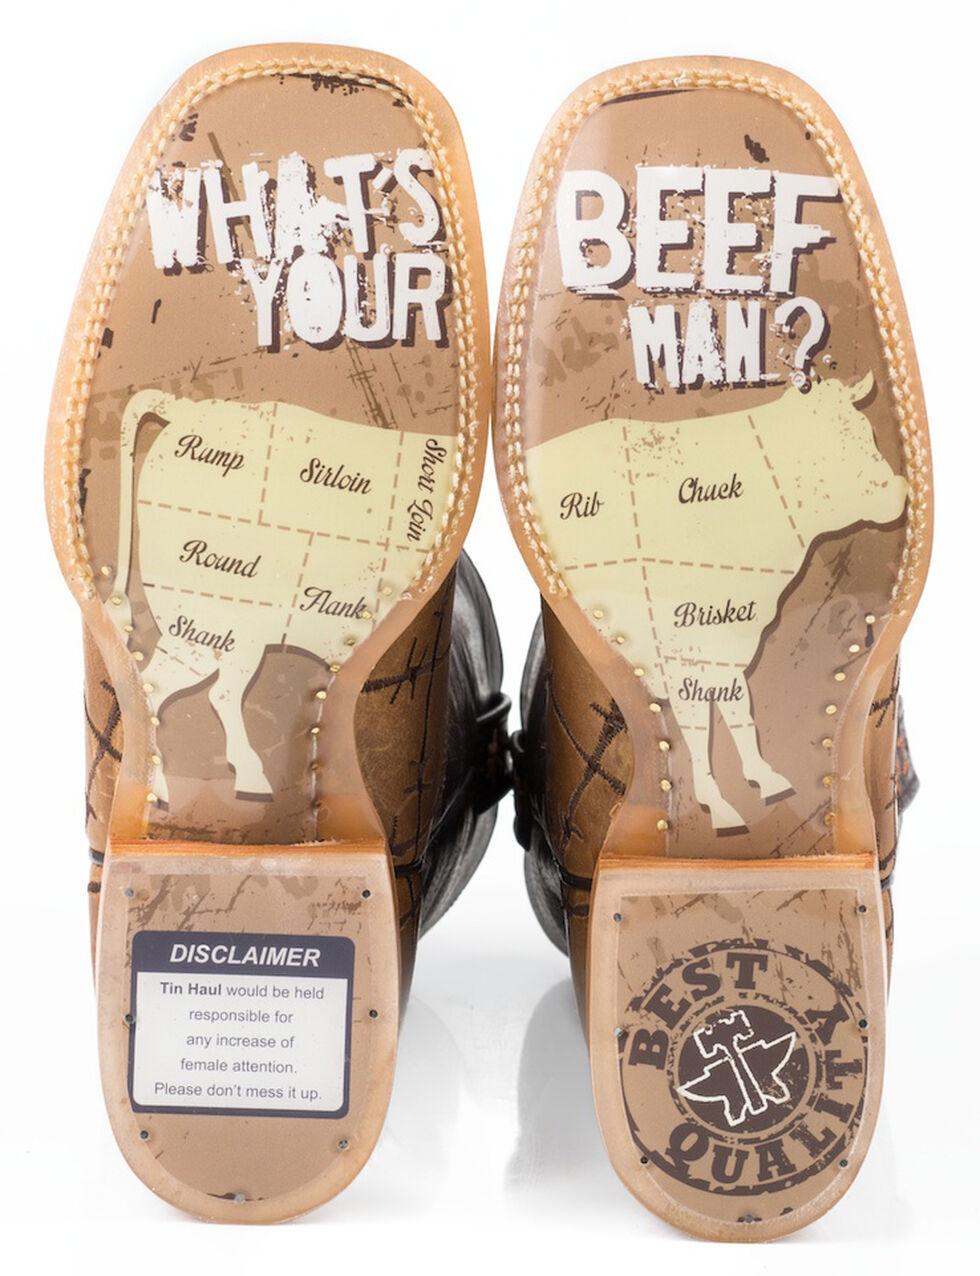 Tin Haul Barbed Wire Butcher Shop Cowboy Boots - Square Toe, Brown, hi-res